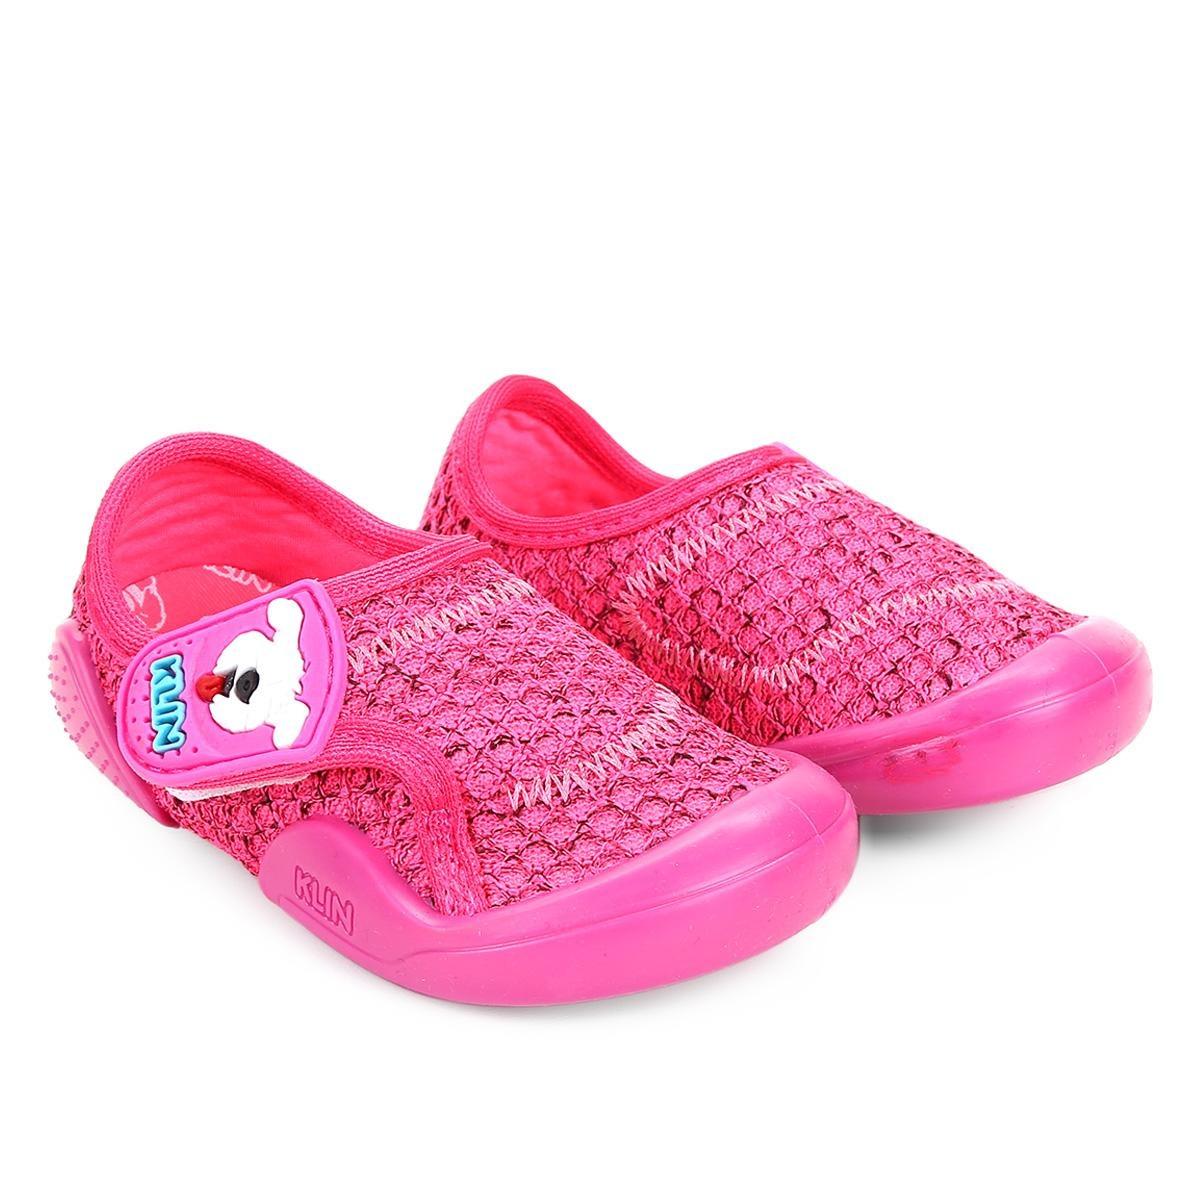 077112d8c1 tênis infantil klin new confort feminino. Carregando zoom.